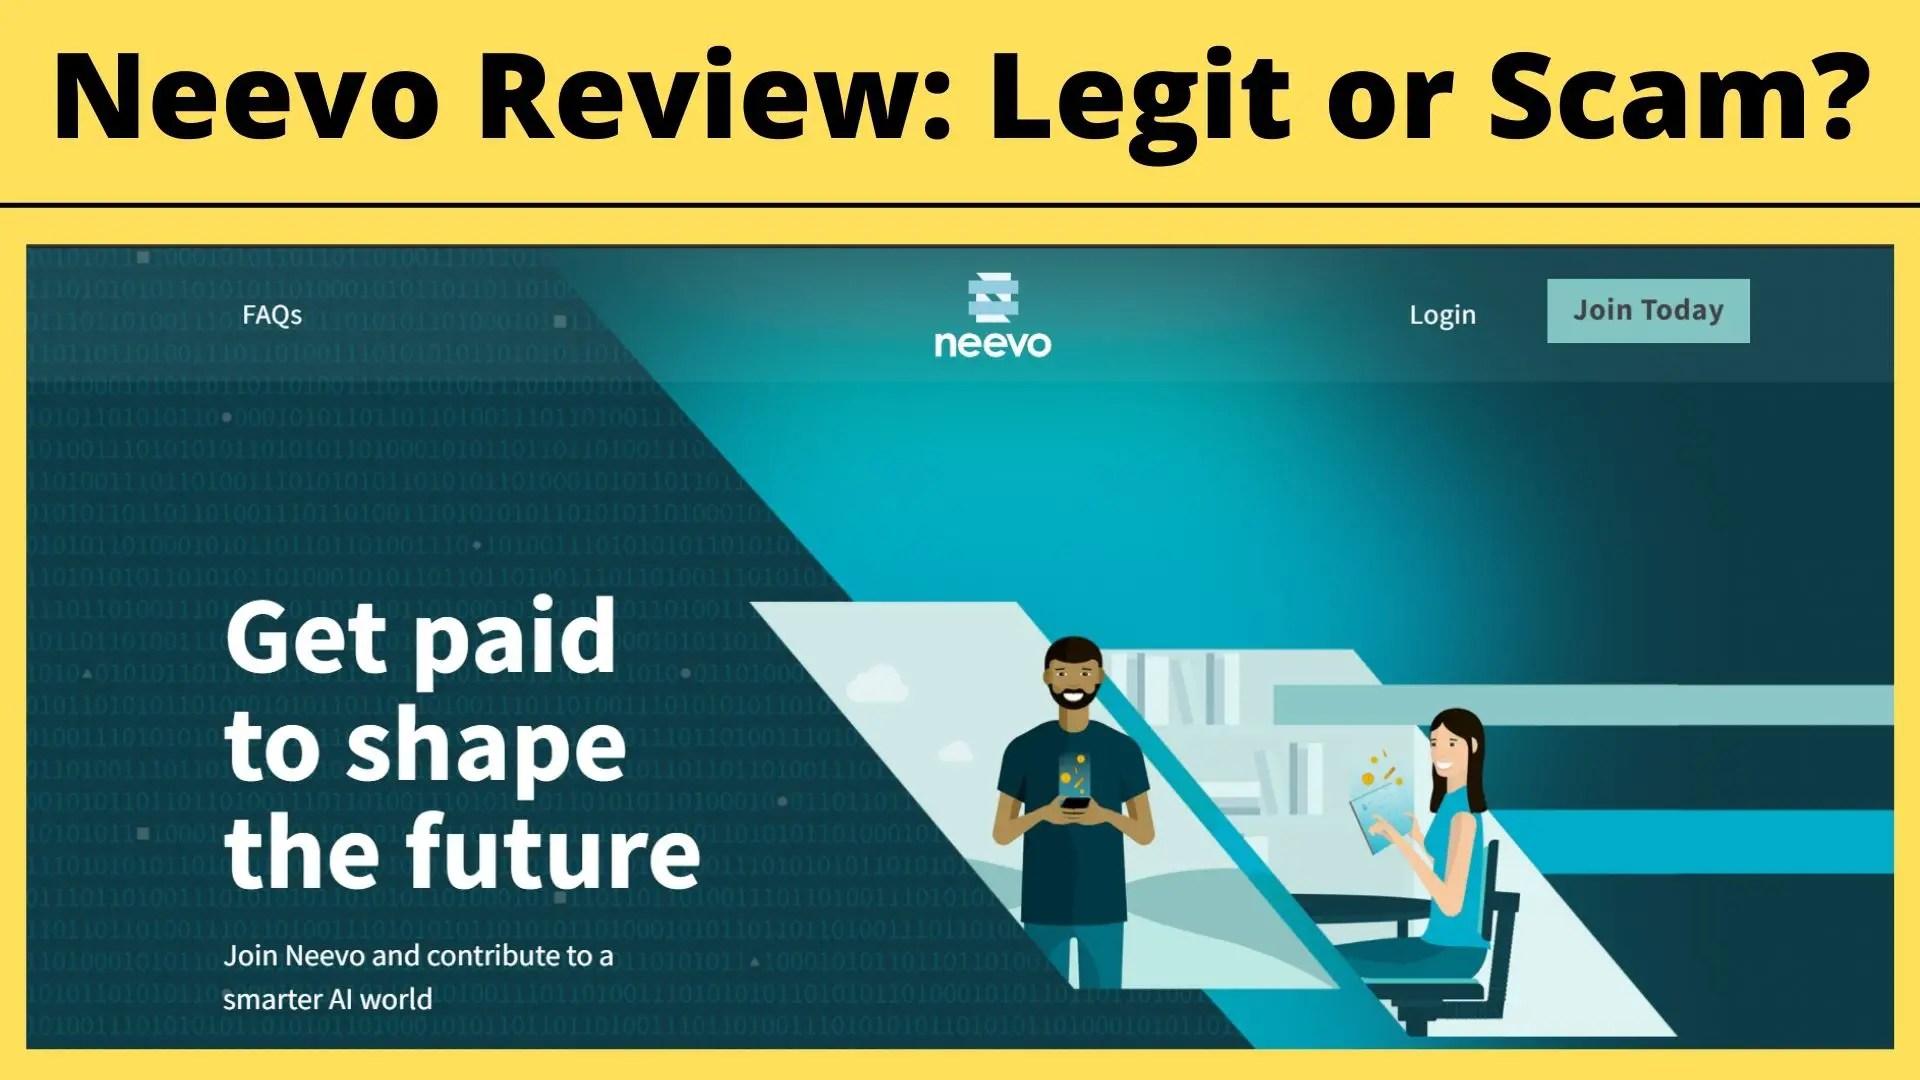 Neevo Review: Neevo DefineCrowd Review: Is It A Legit Website?